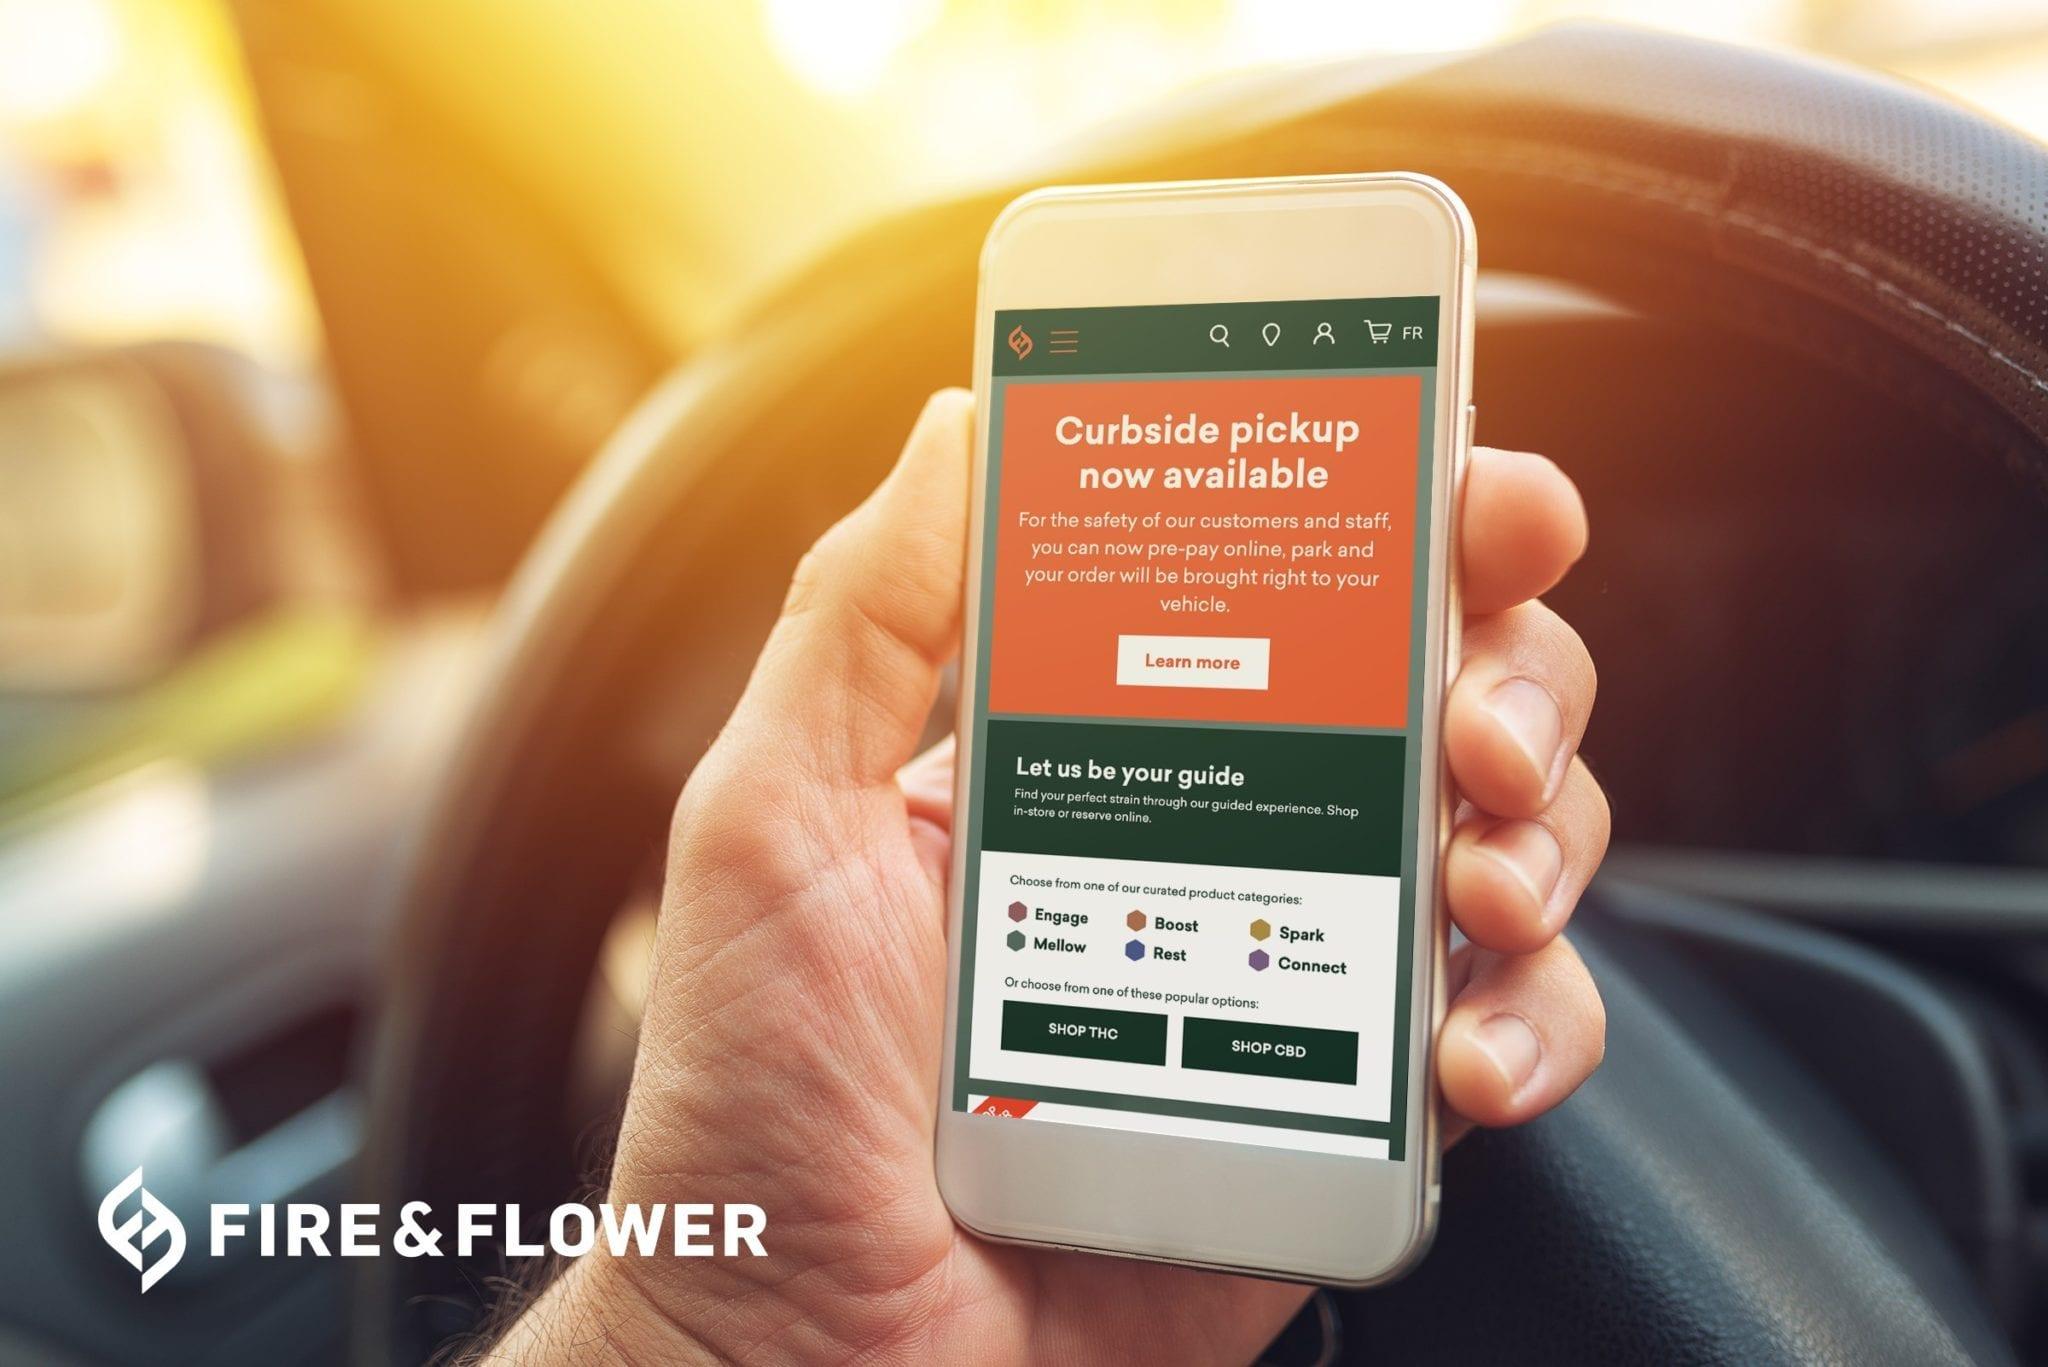 Fire-Flower-ups-online-options-says-Ontario-closures-bolster-black-market